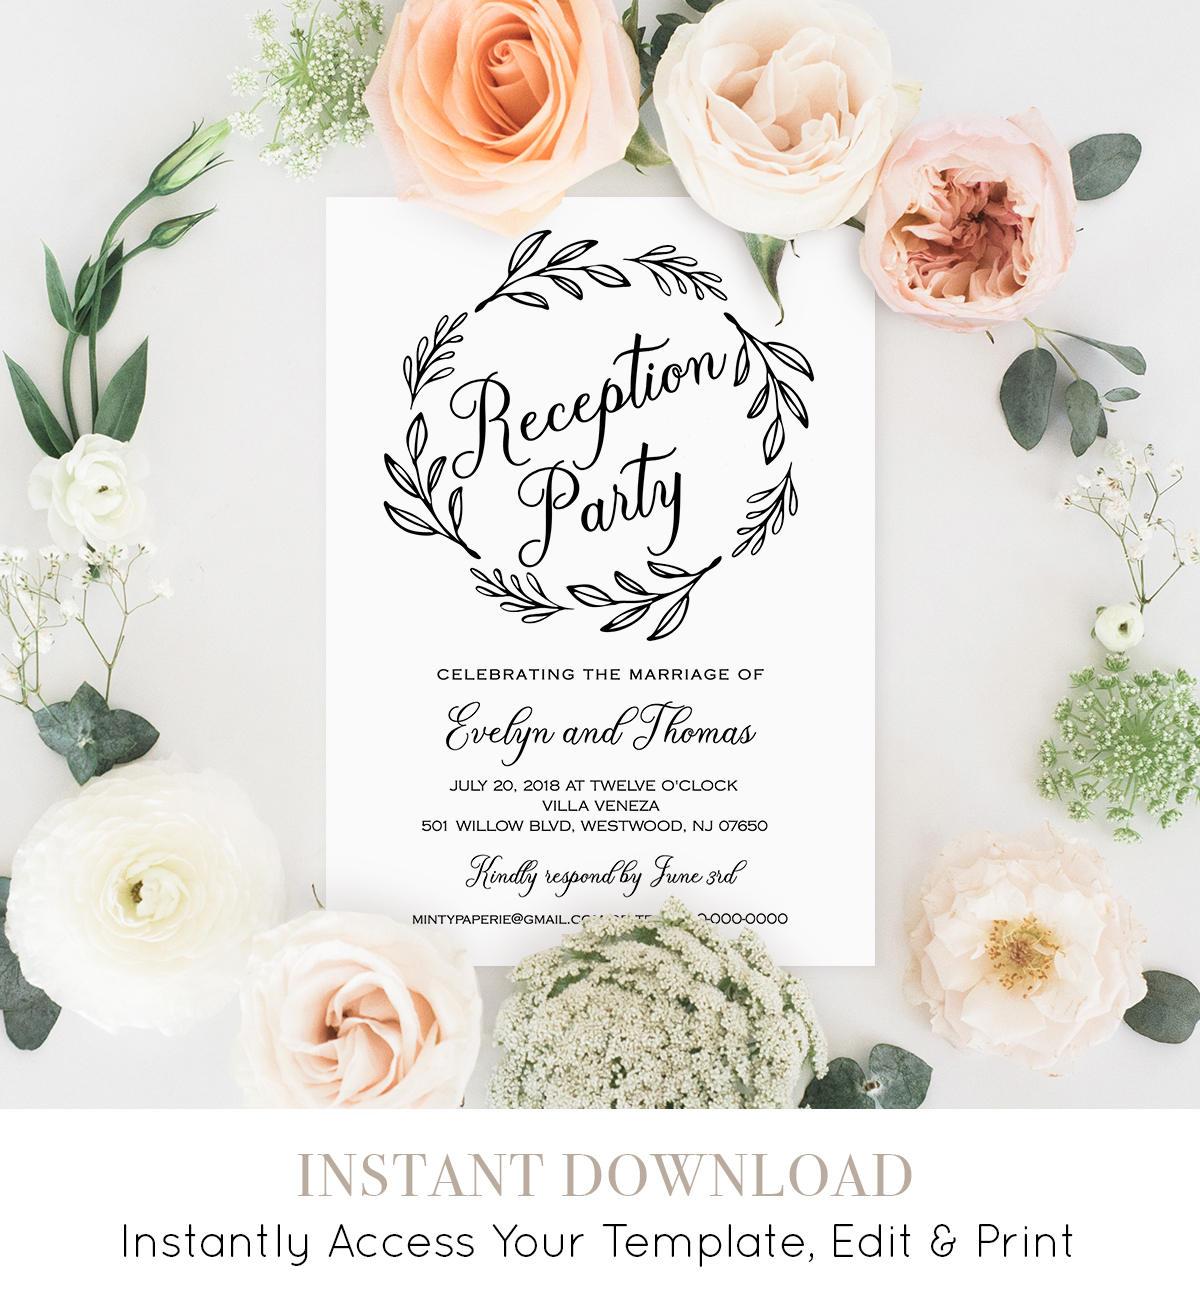 reception party invitation template wedding reception printable